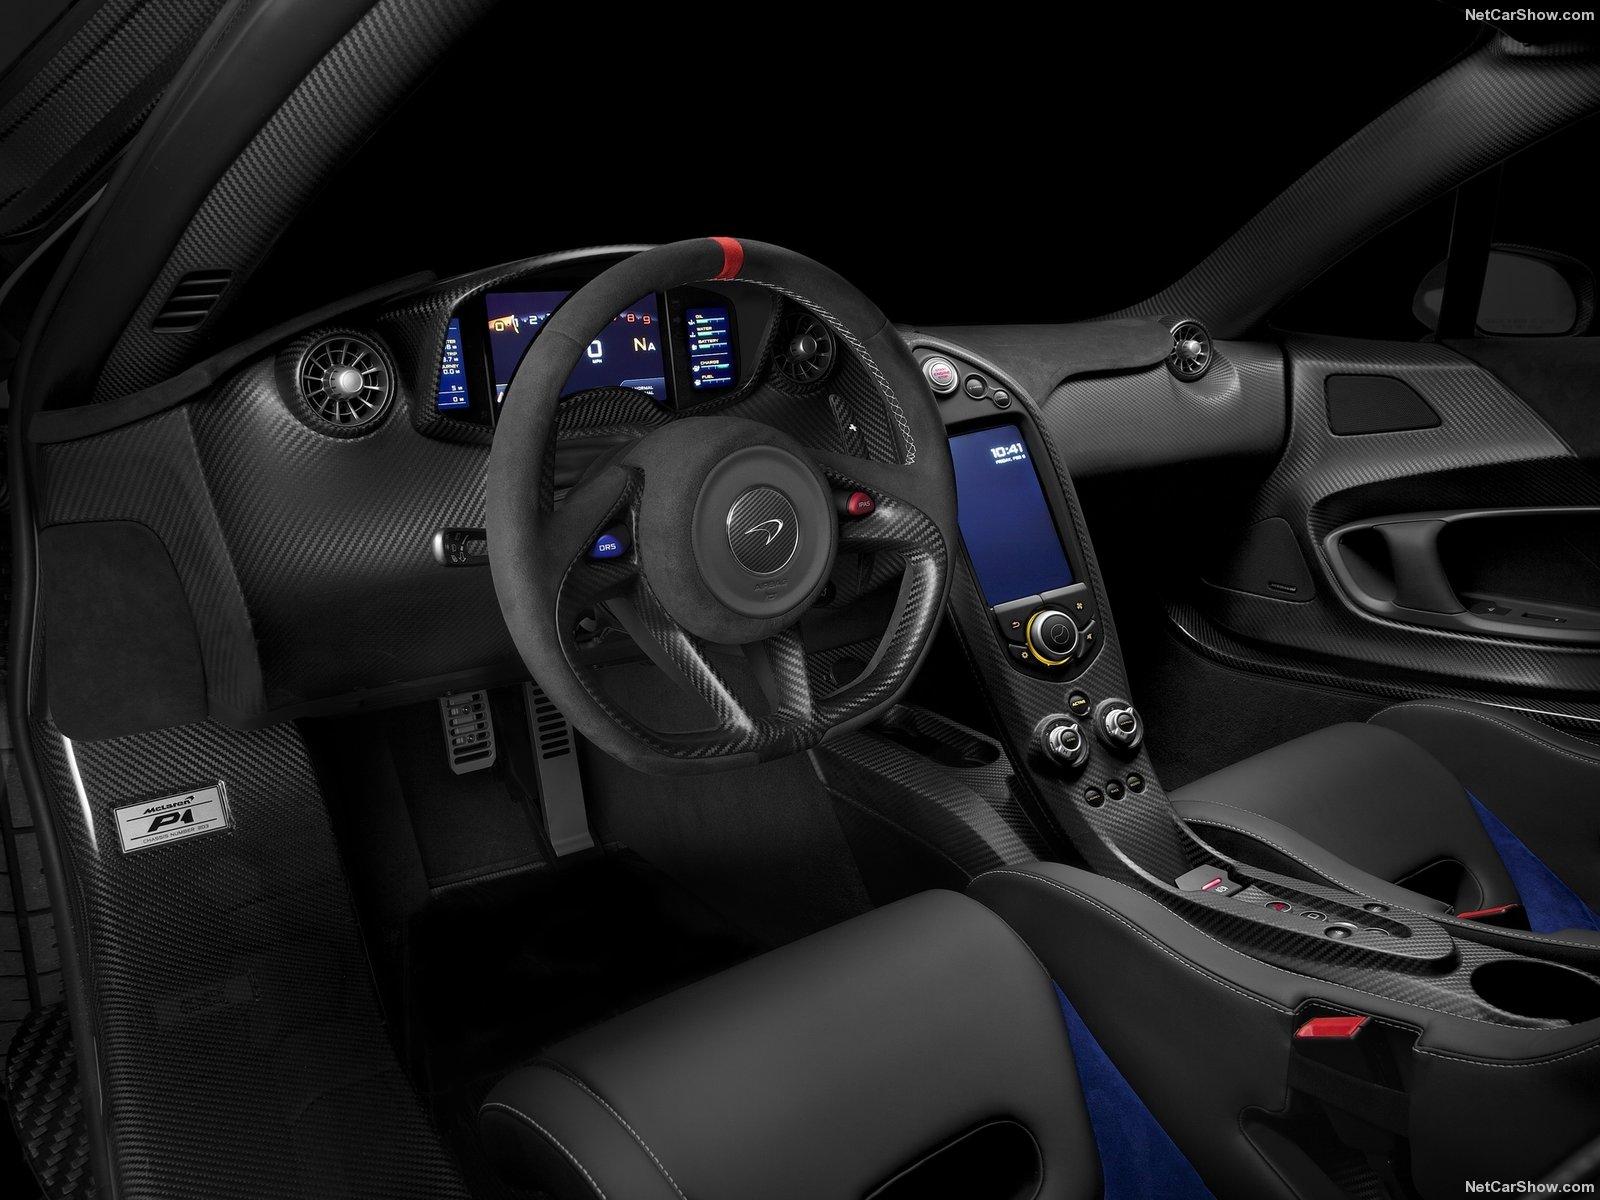 McLaren P1 2015 Interior - Sports Car